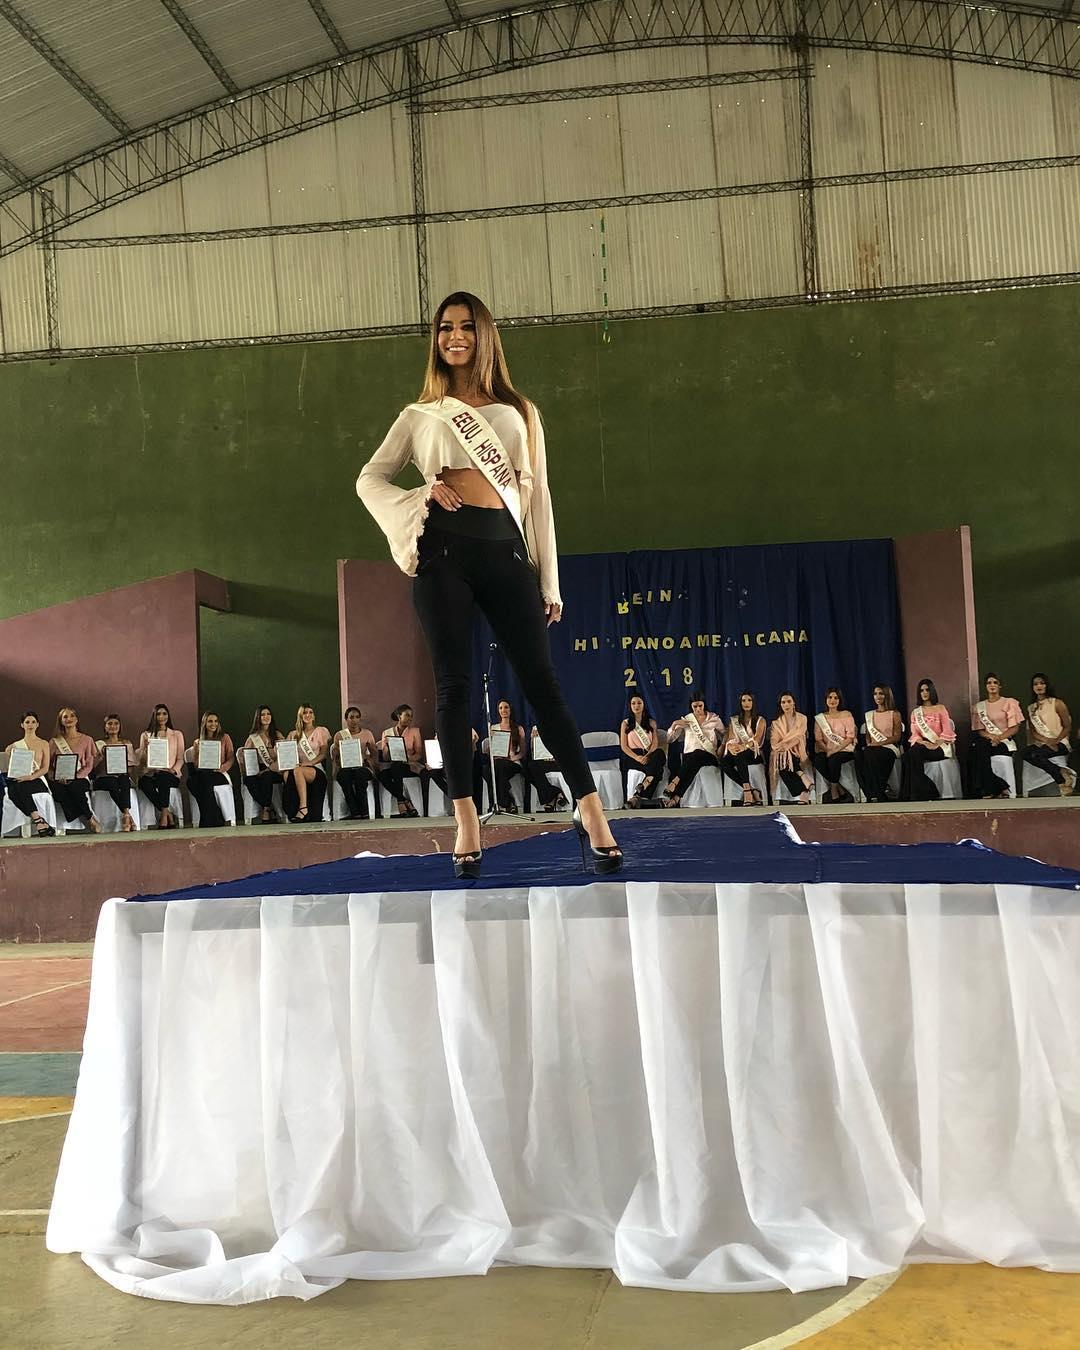 geraldine chaparro, miss usa hispanoamericana 2018/miss mundo latina turismo usa 2018. - Página 3 42929210